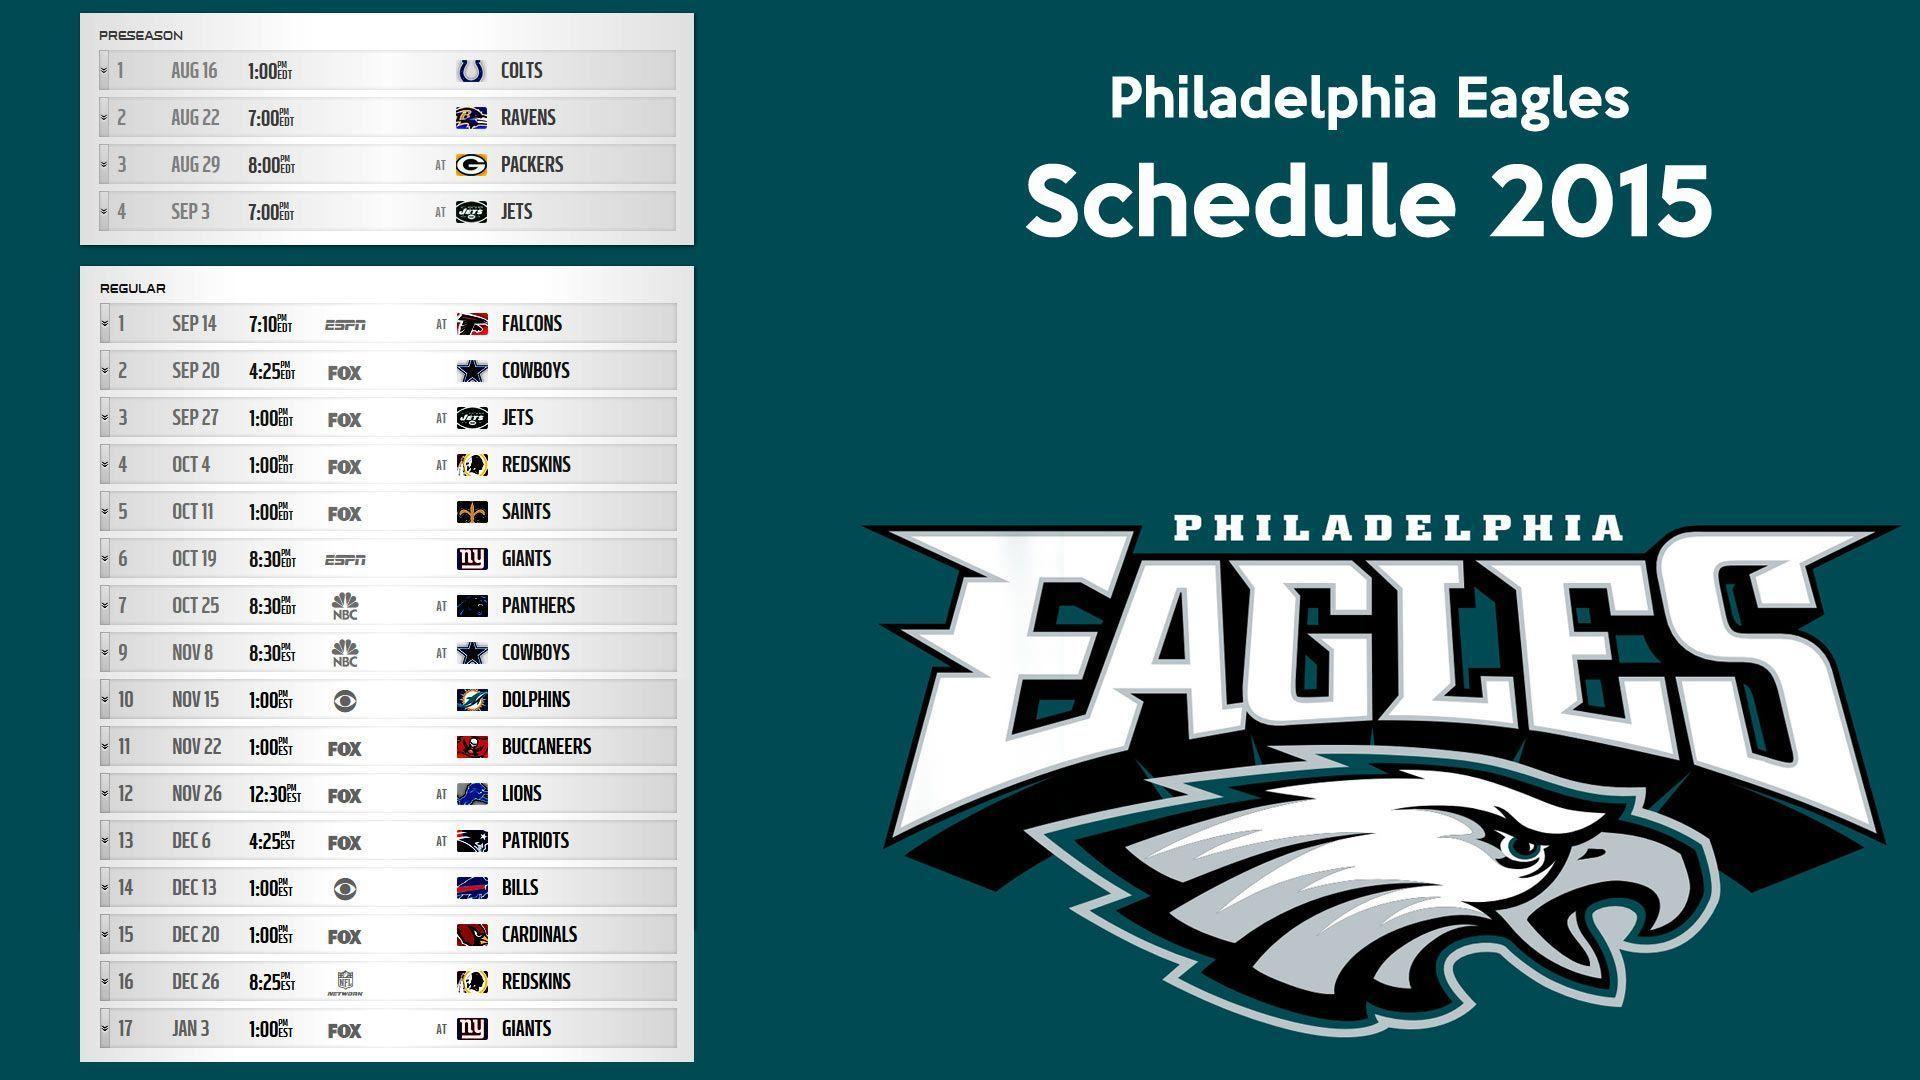 Philadelphia Eagles 2016 Schedule Wallpapers - Wallpaper Cave